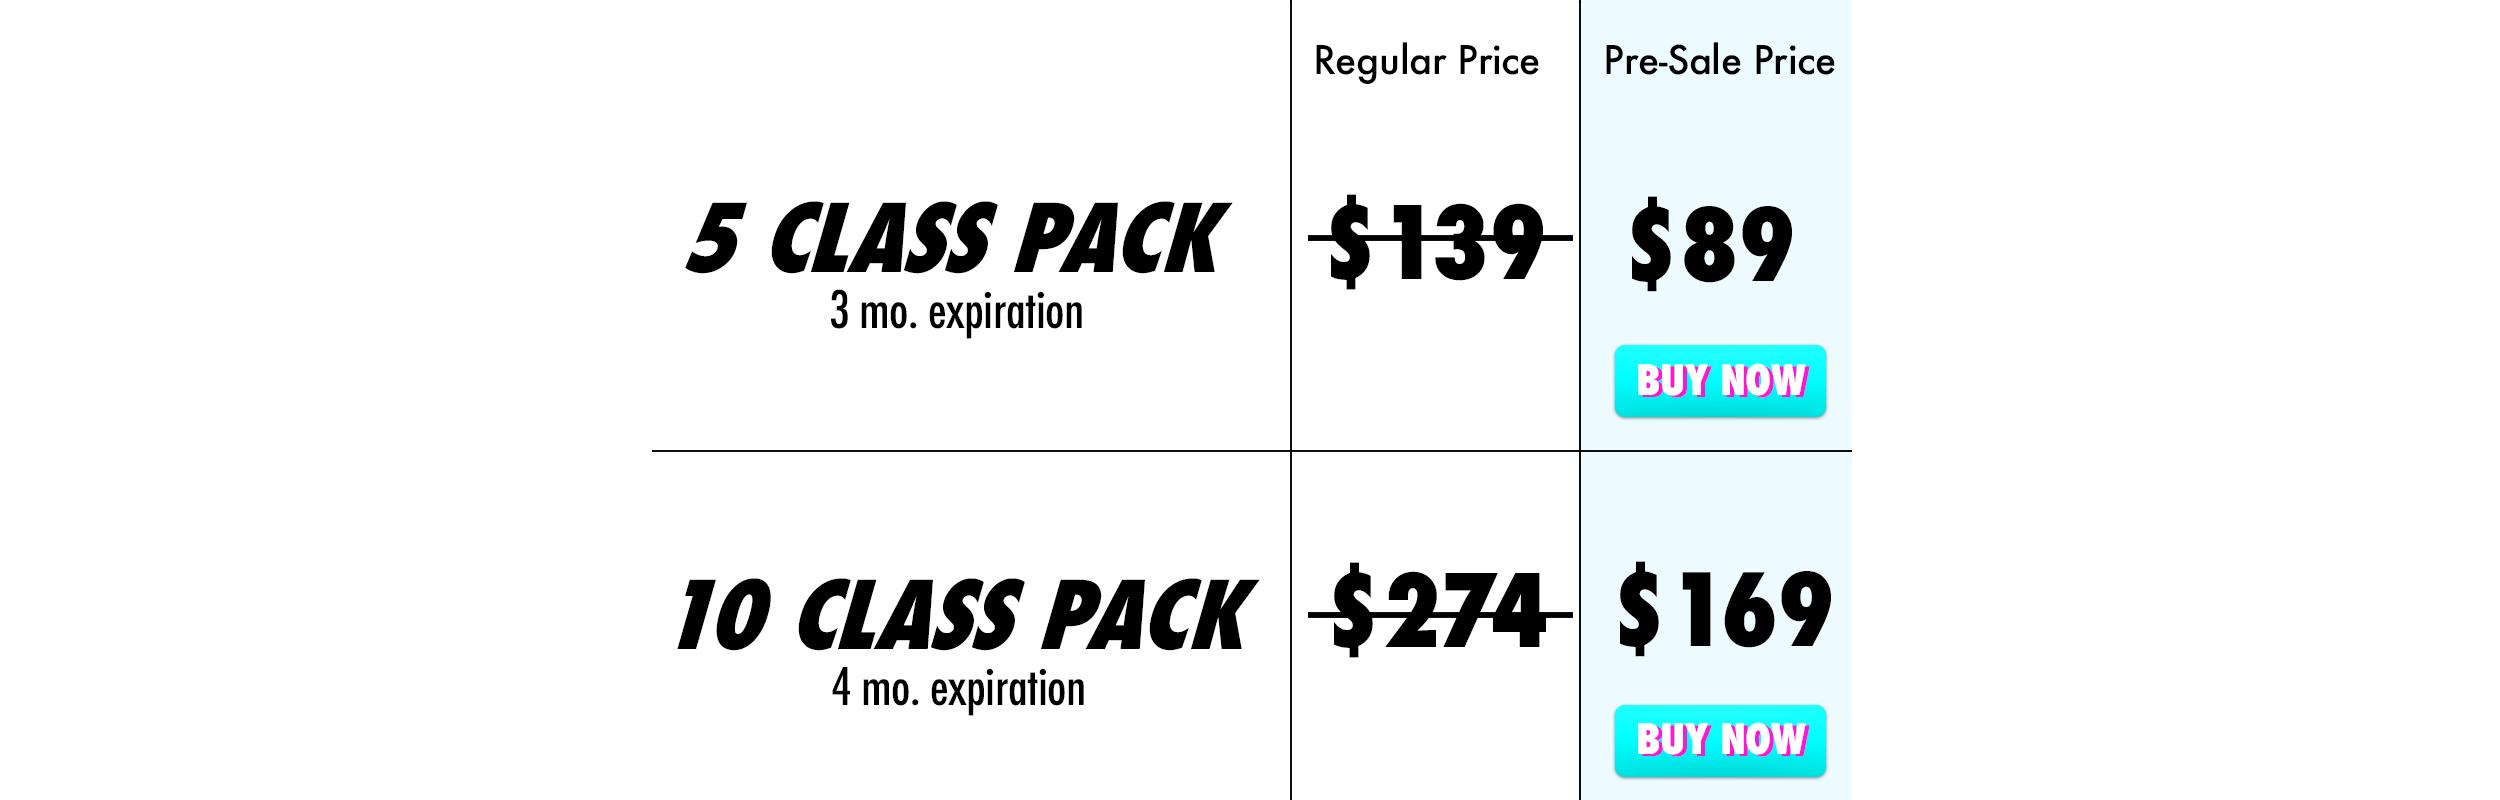 Presale Offerings 5 Pack and 10 Pack Discounted Rate.jpg